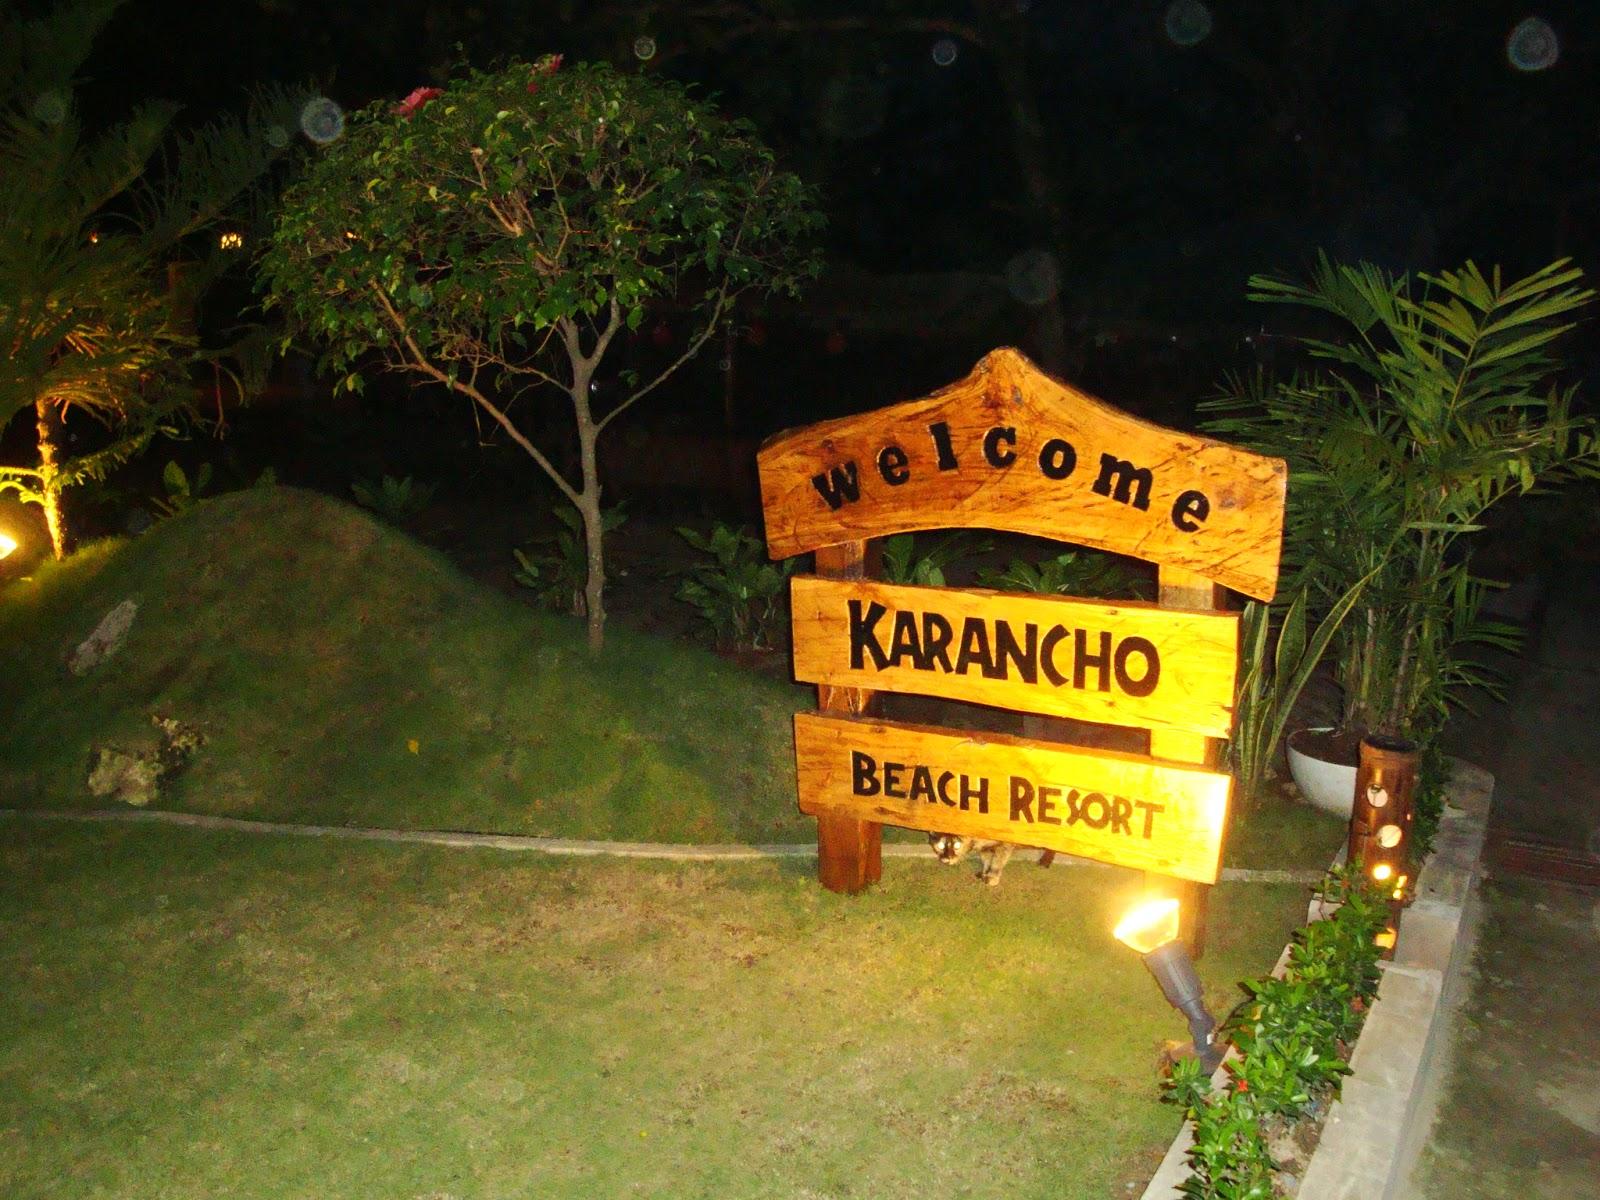 Unforgettable Overnight Stay at Karancho Beach Resort in Mactan